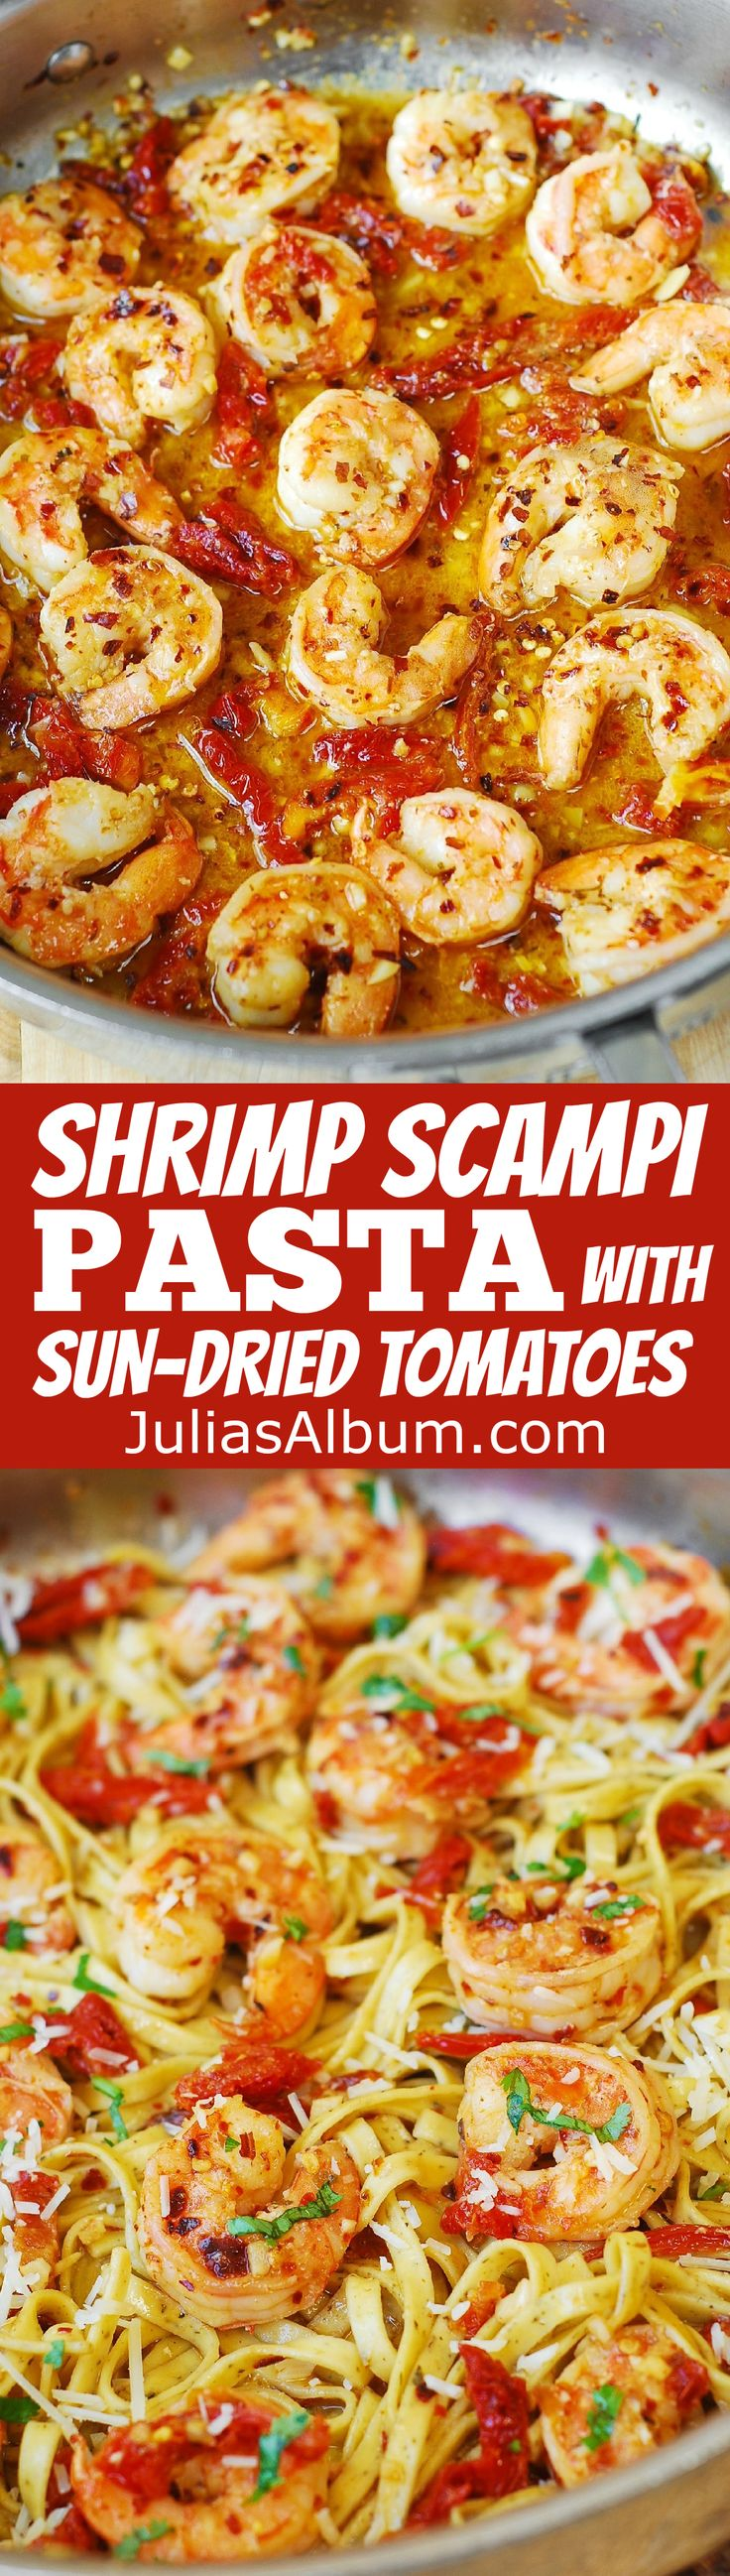 Shrimp Scampi Pasta with Sun-Dried tomatoes #SUMMER #Italian #Mediterranean #recipe